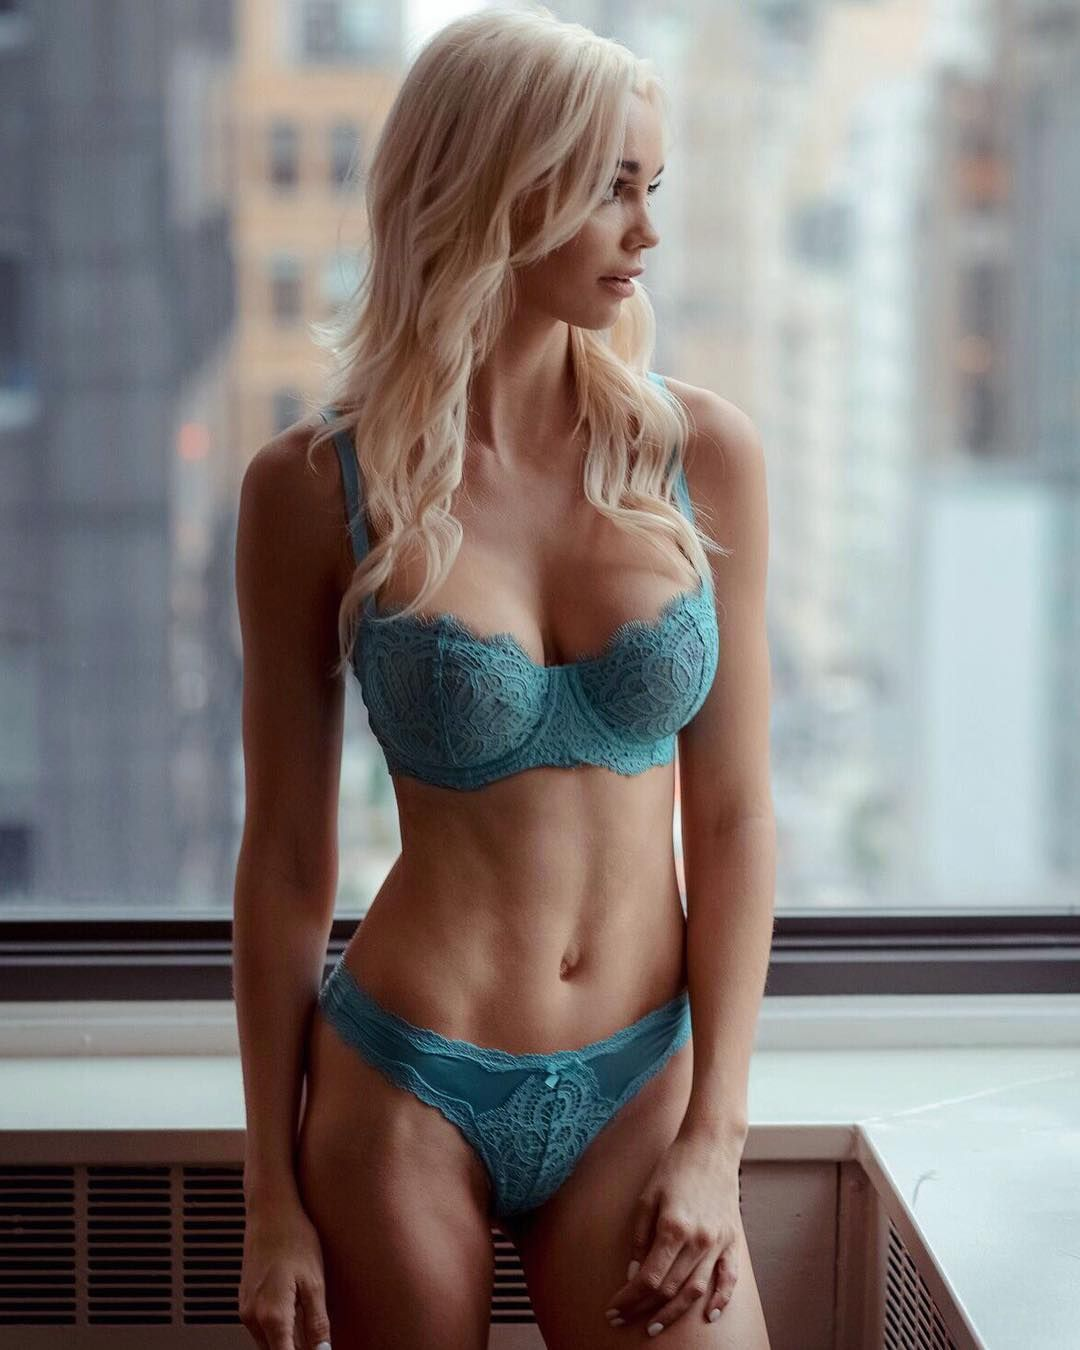 6fea844d9b Img lingerie models sexy lingerie blue lingerie fashion models jpg  1080x1350 Blue lingerie models fitness